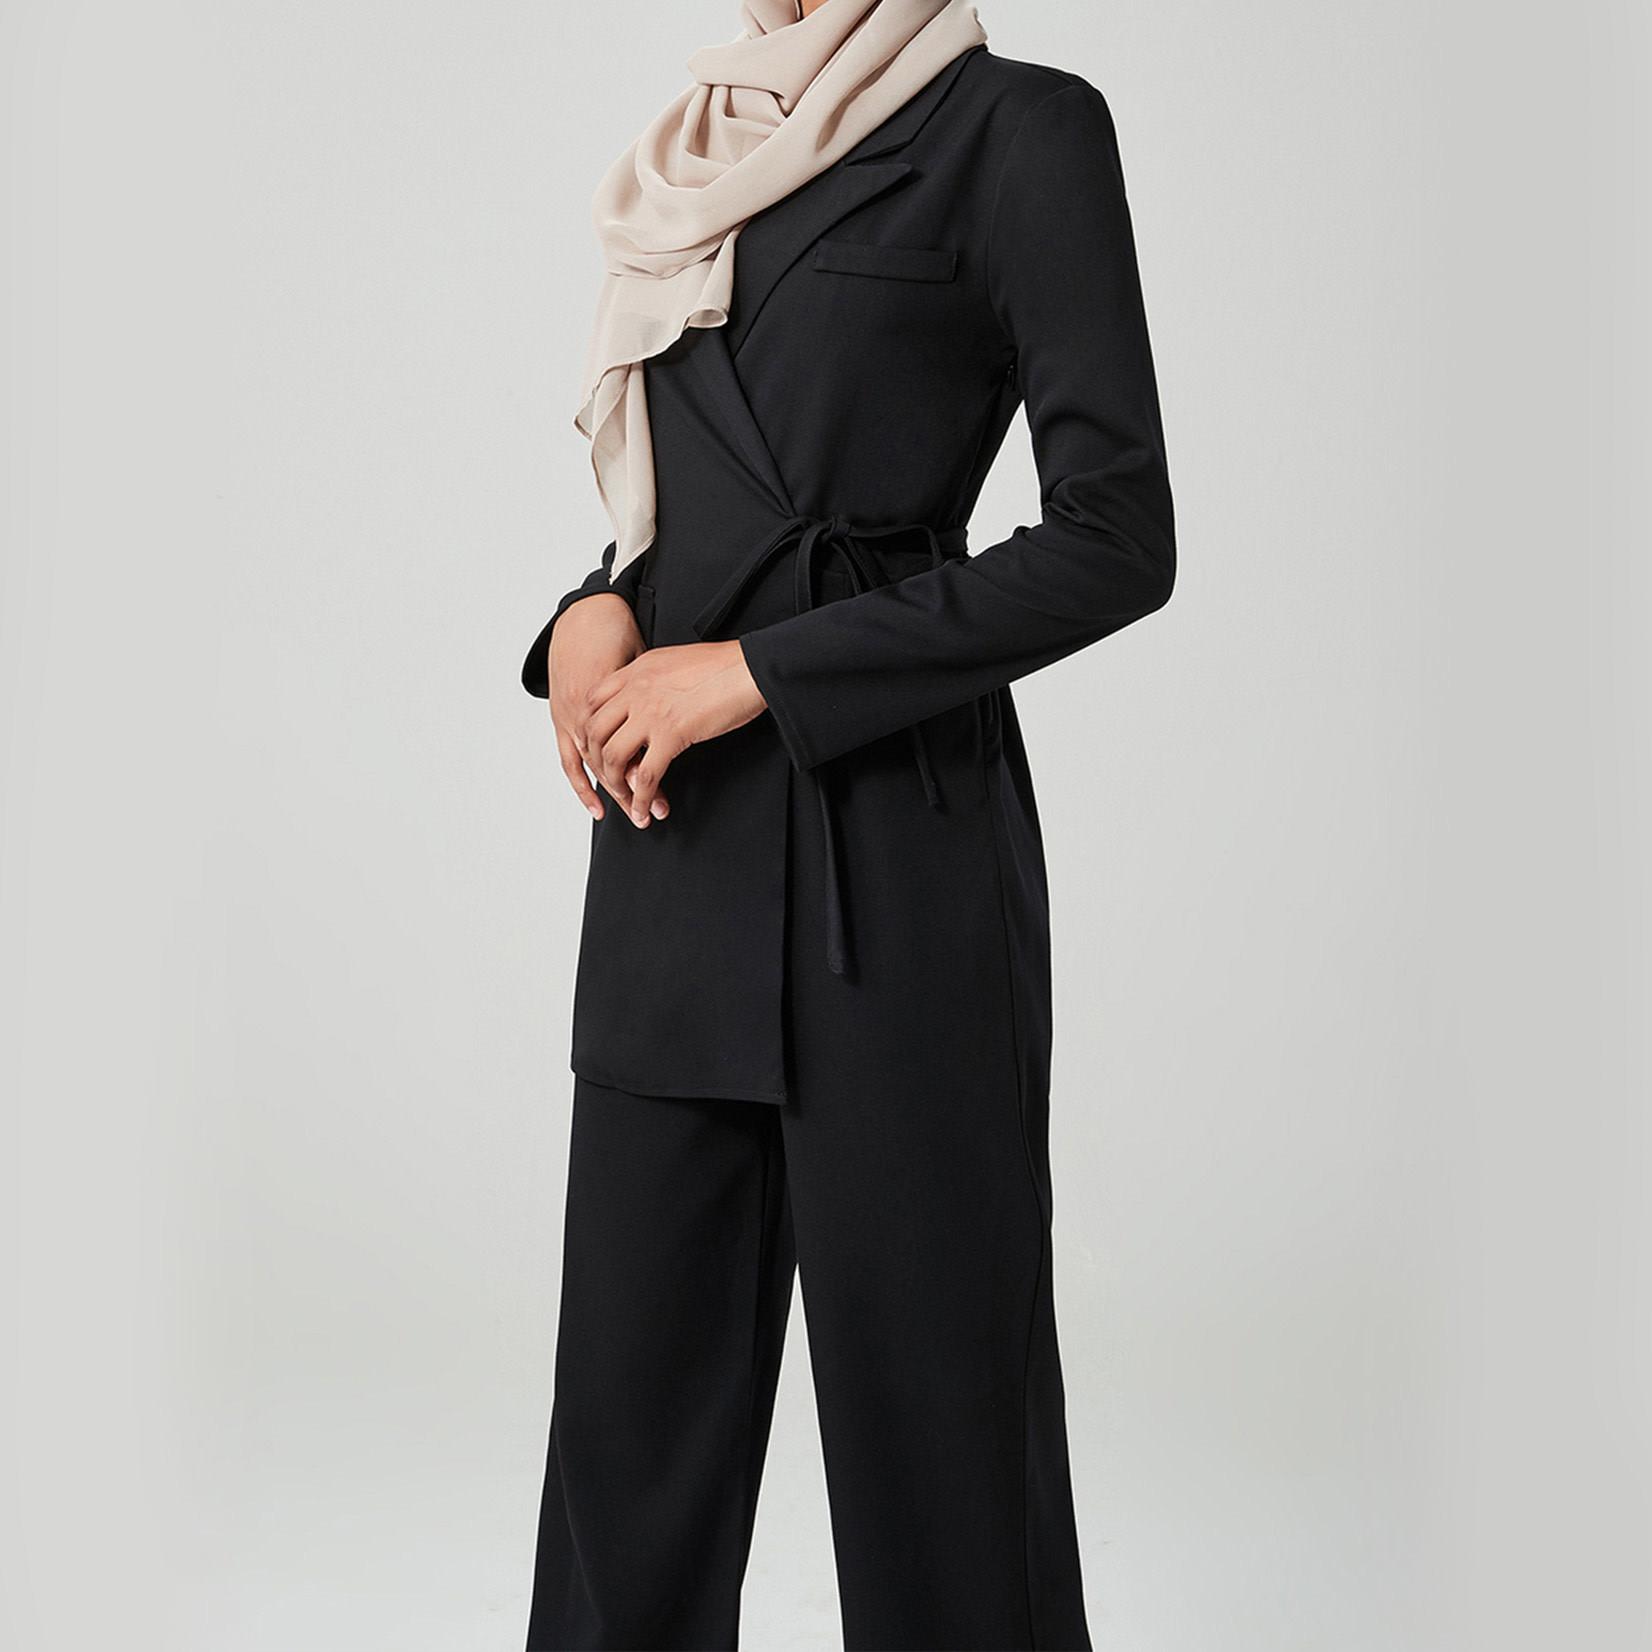 Hijab House Black Wrap jumpsuit